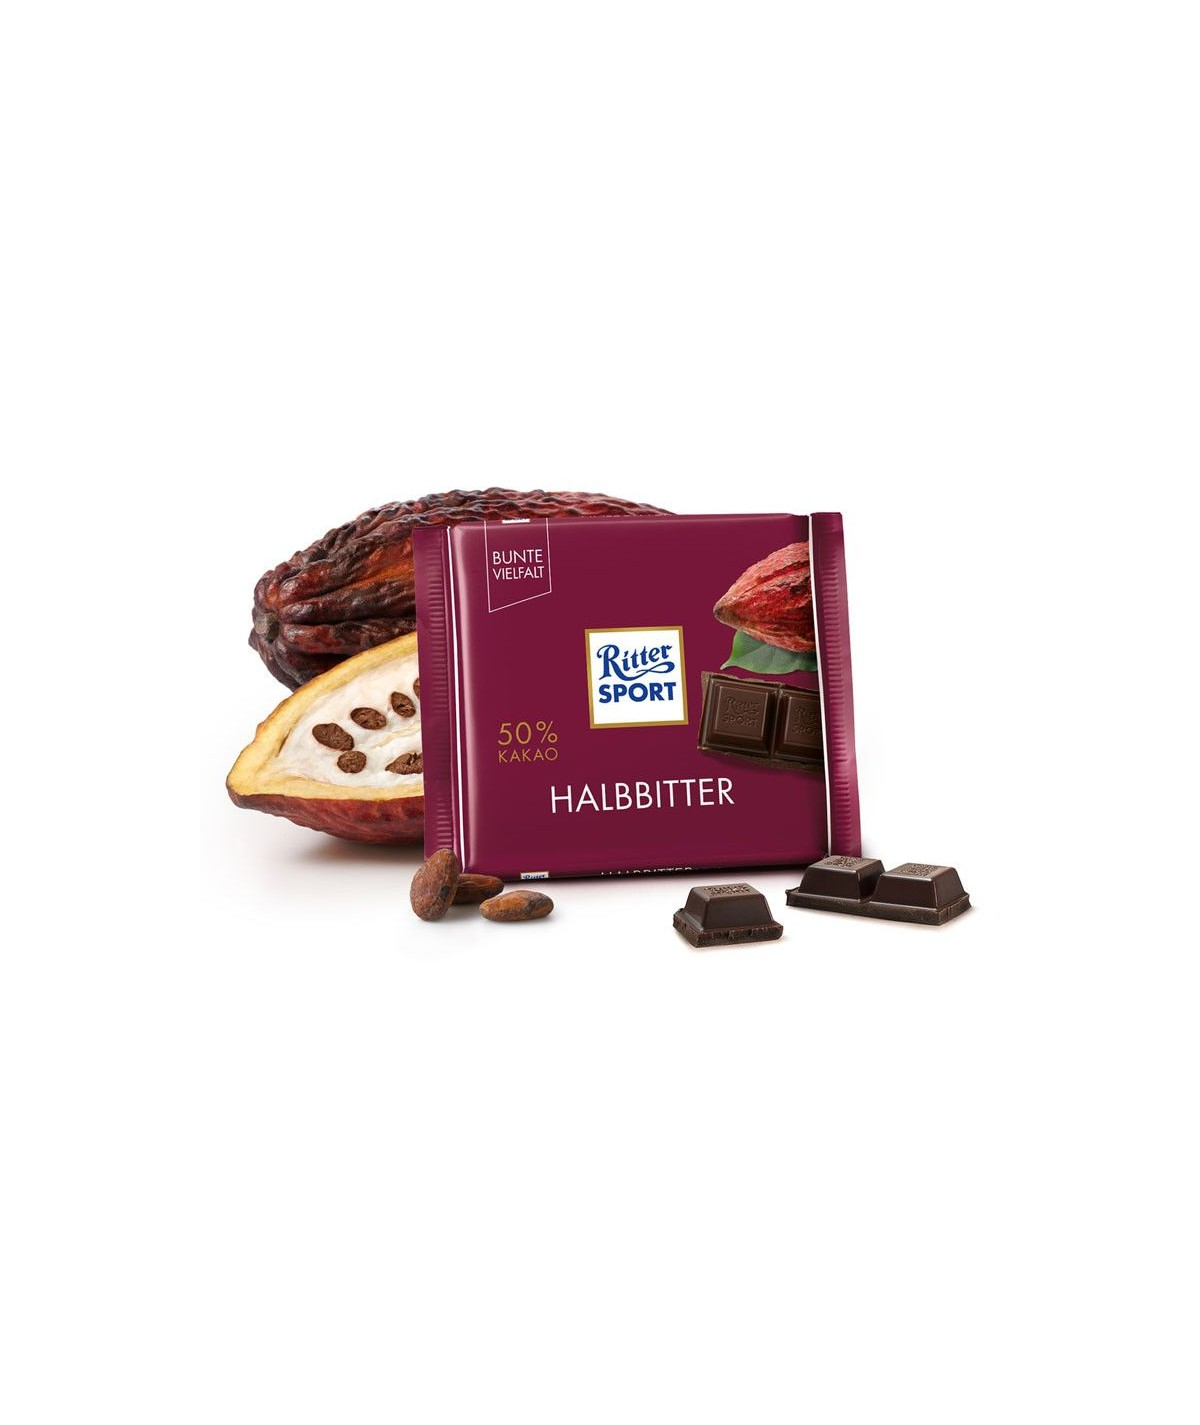 Halbbitter 50% Kakao Ritter Sport 100g